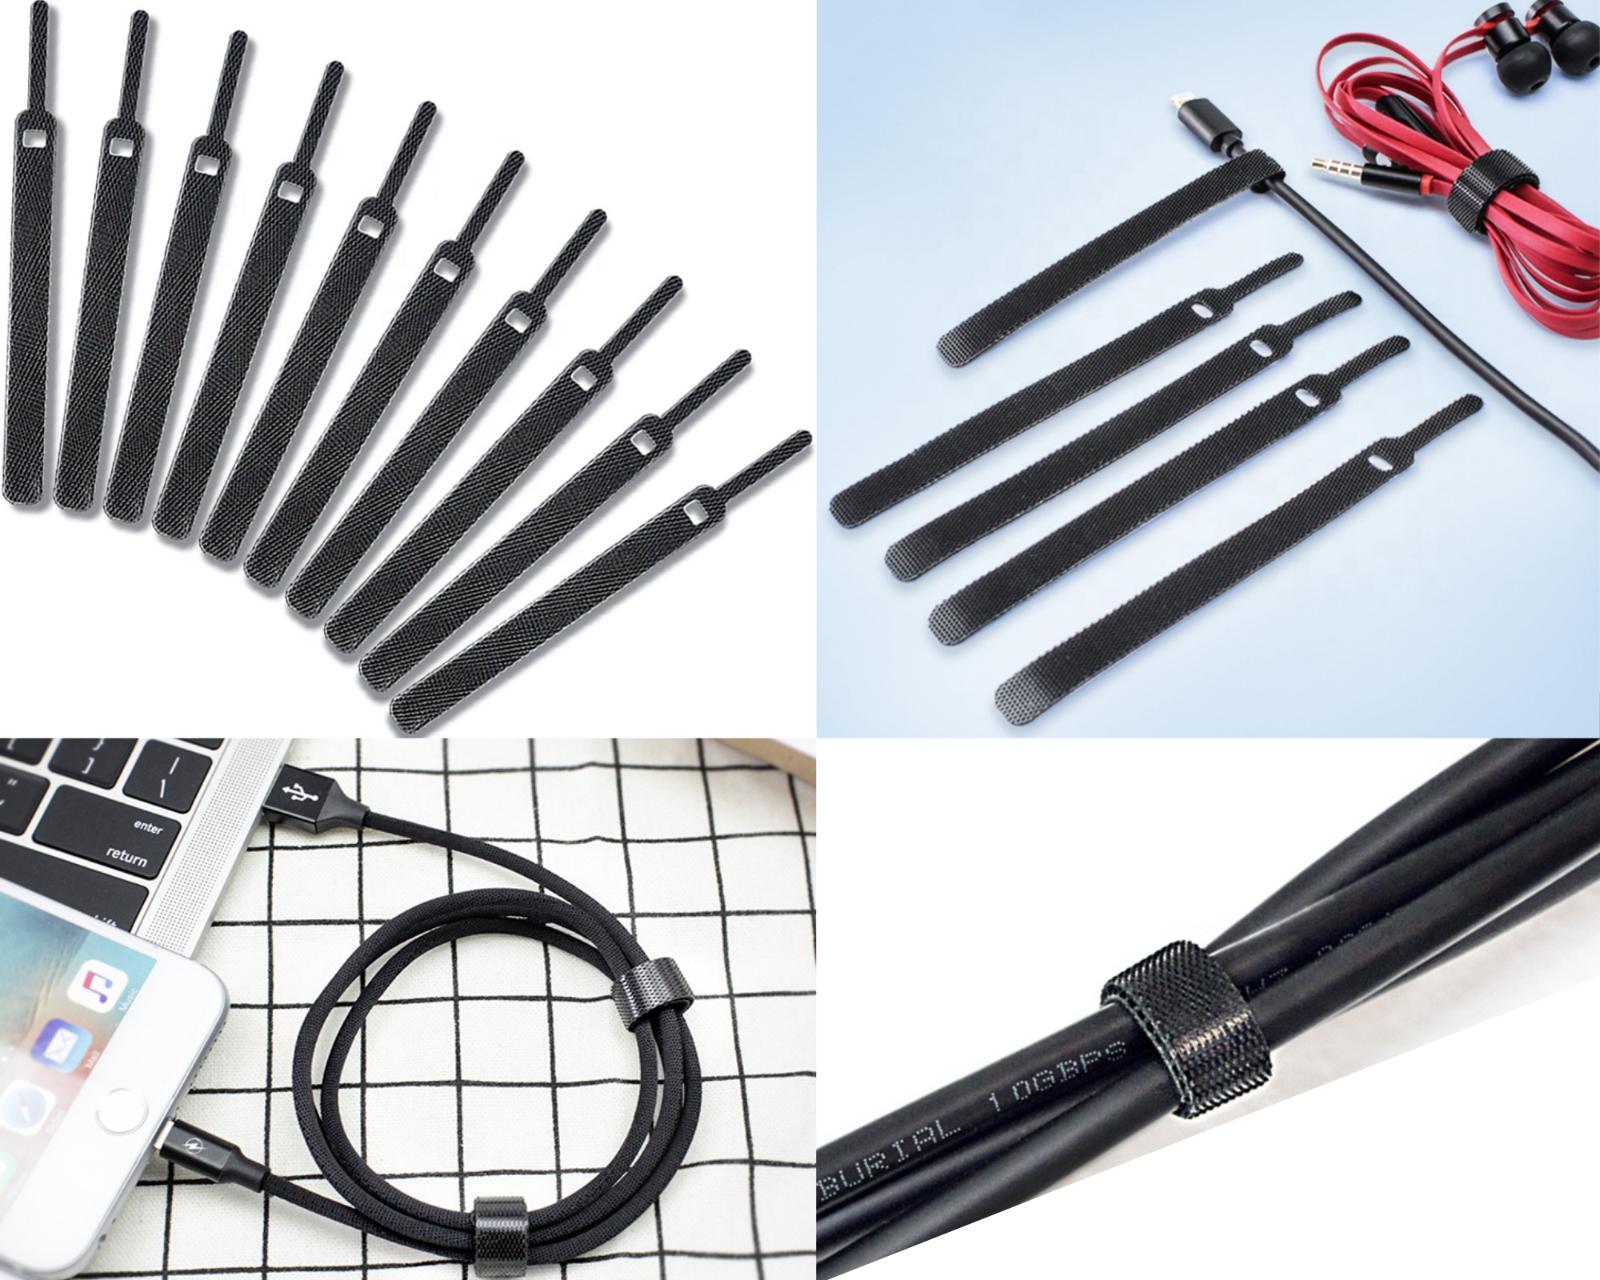 Cable cord wire tie strap organiser USB Nylon hook loop reusable adjust black